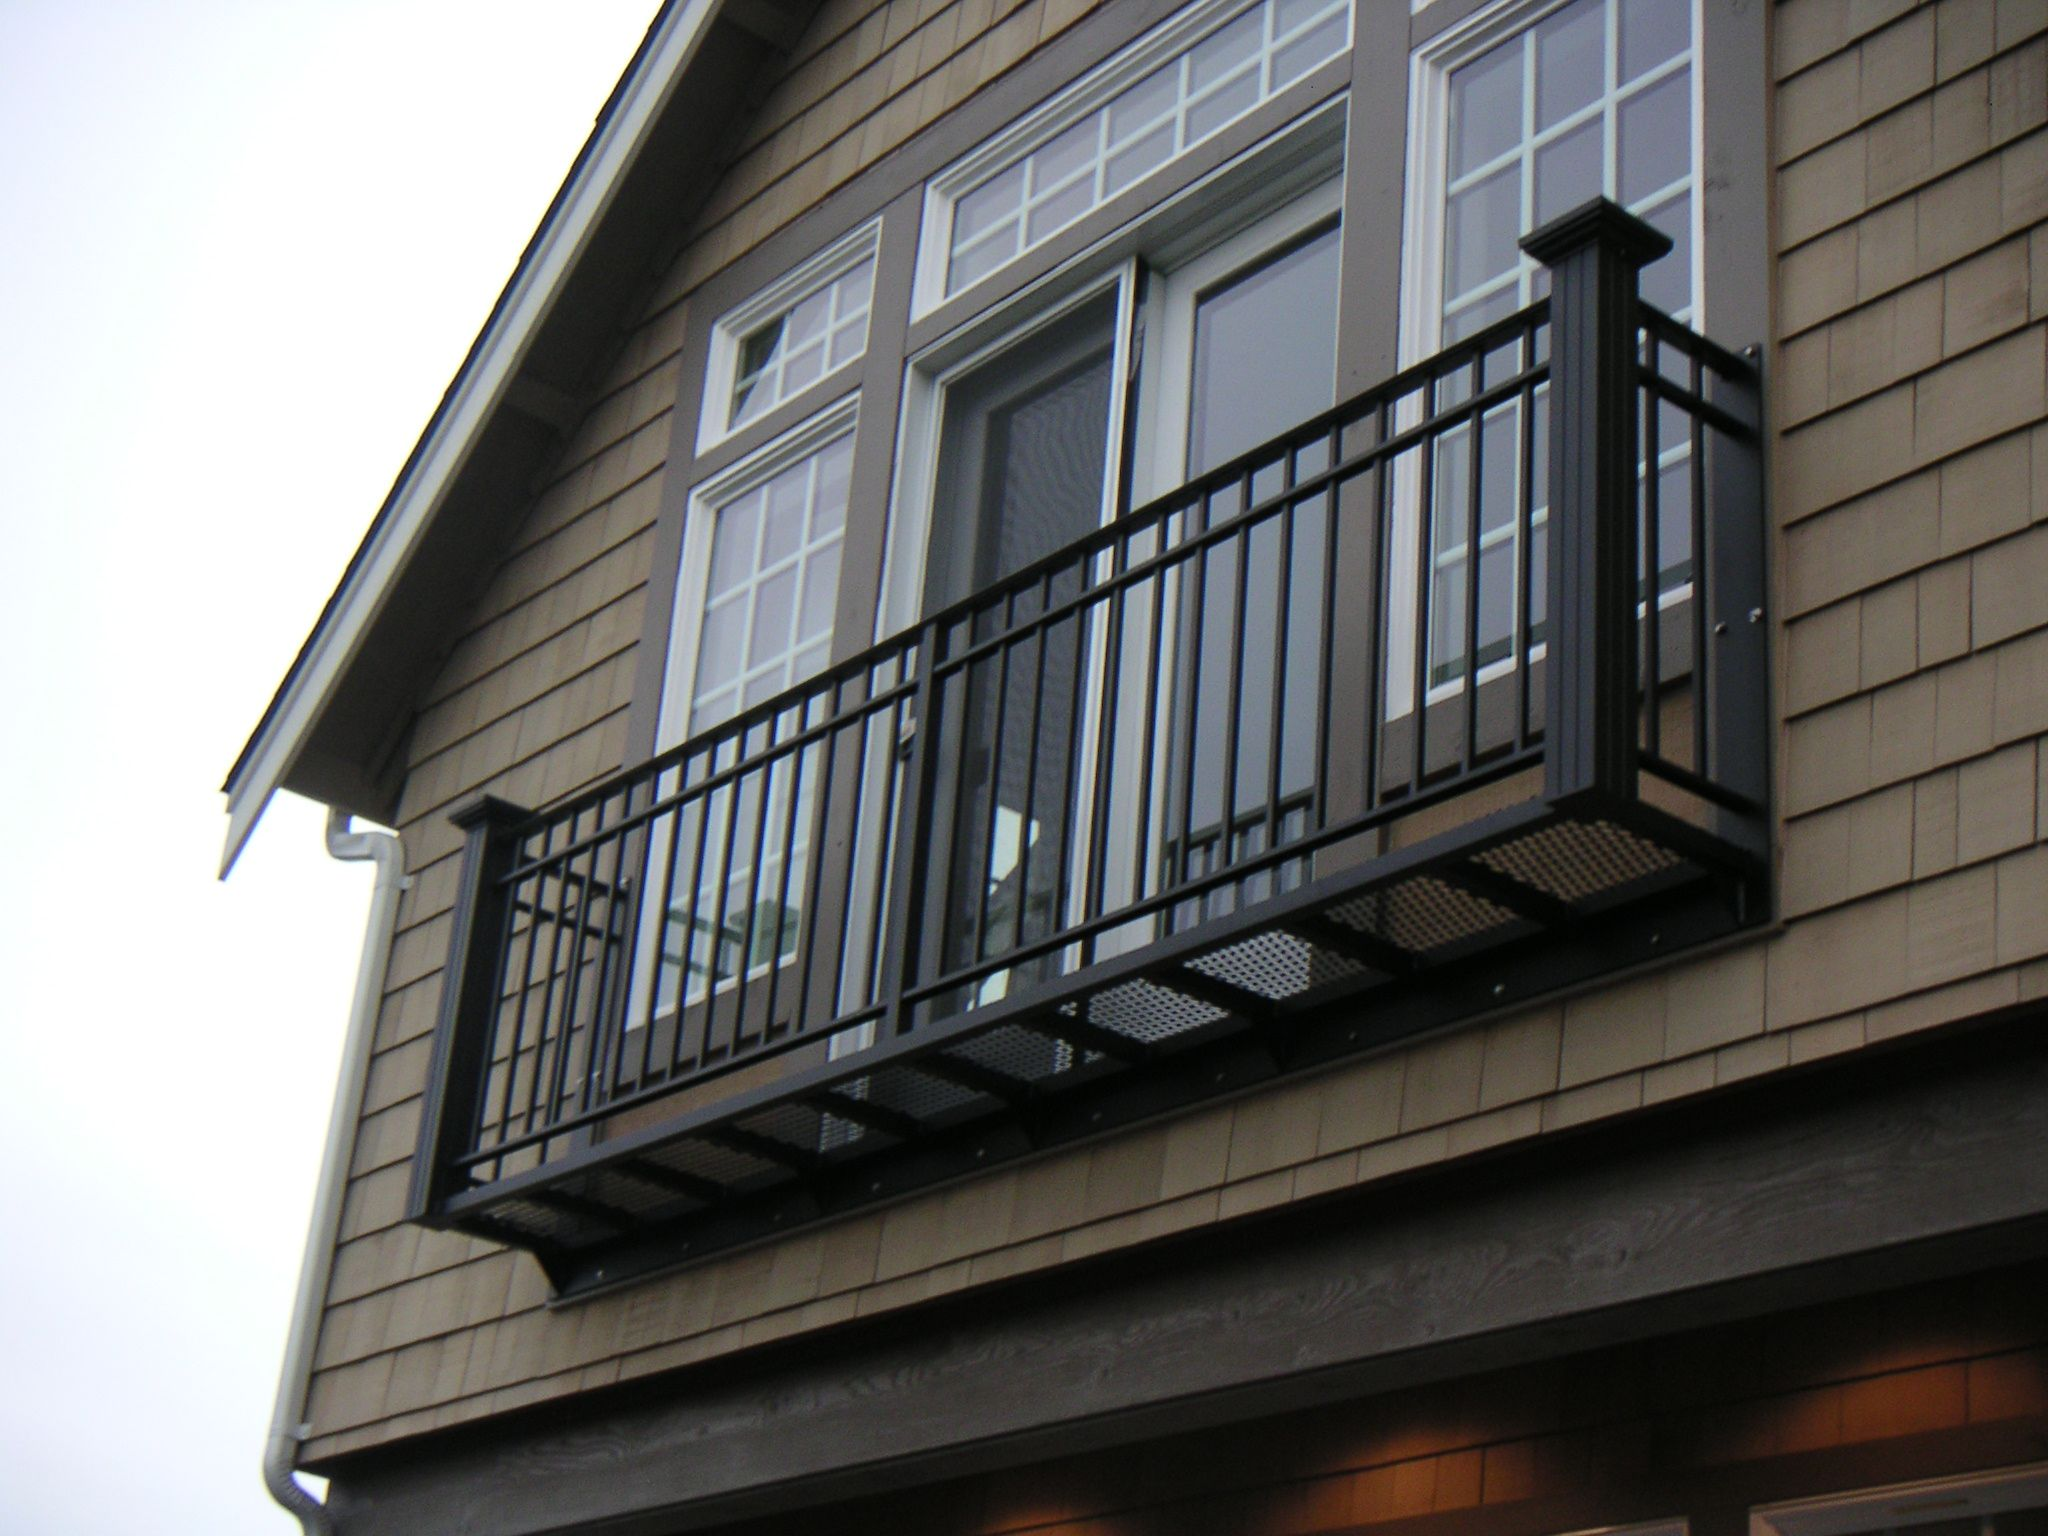 Rail Pro Bolt On Aluminum Balconies Juilette Style